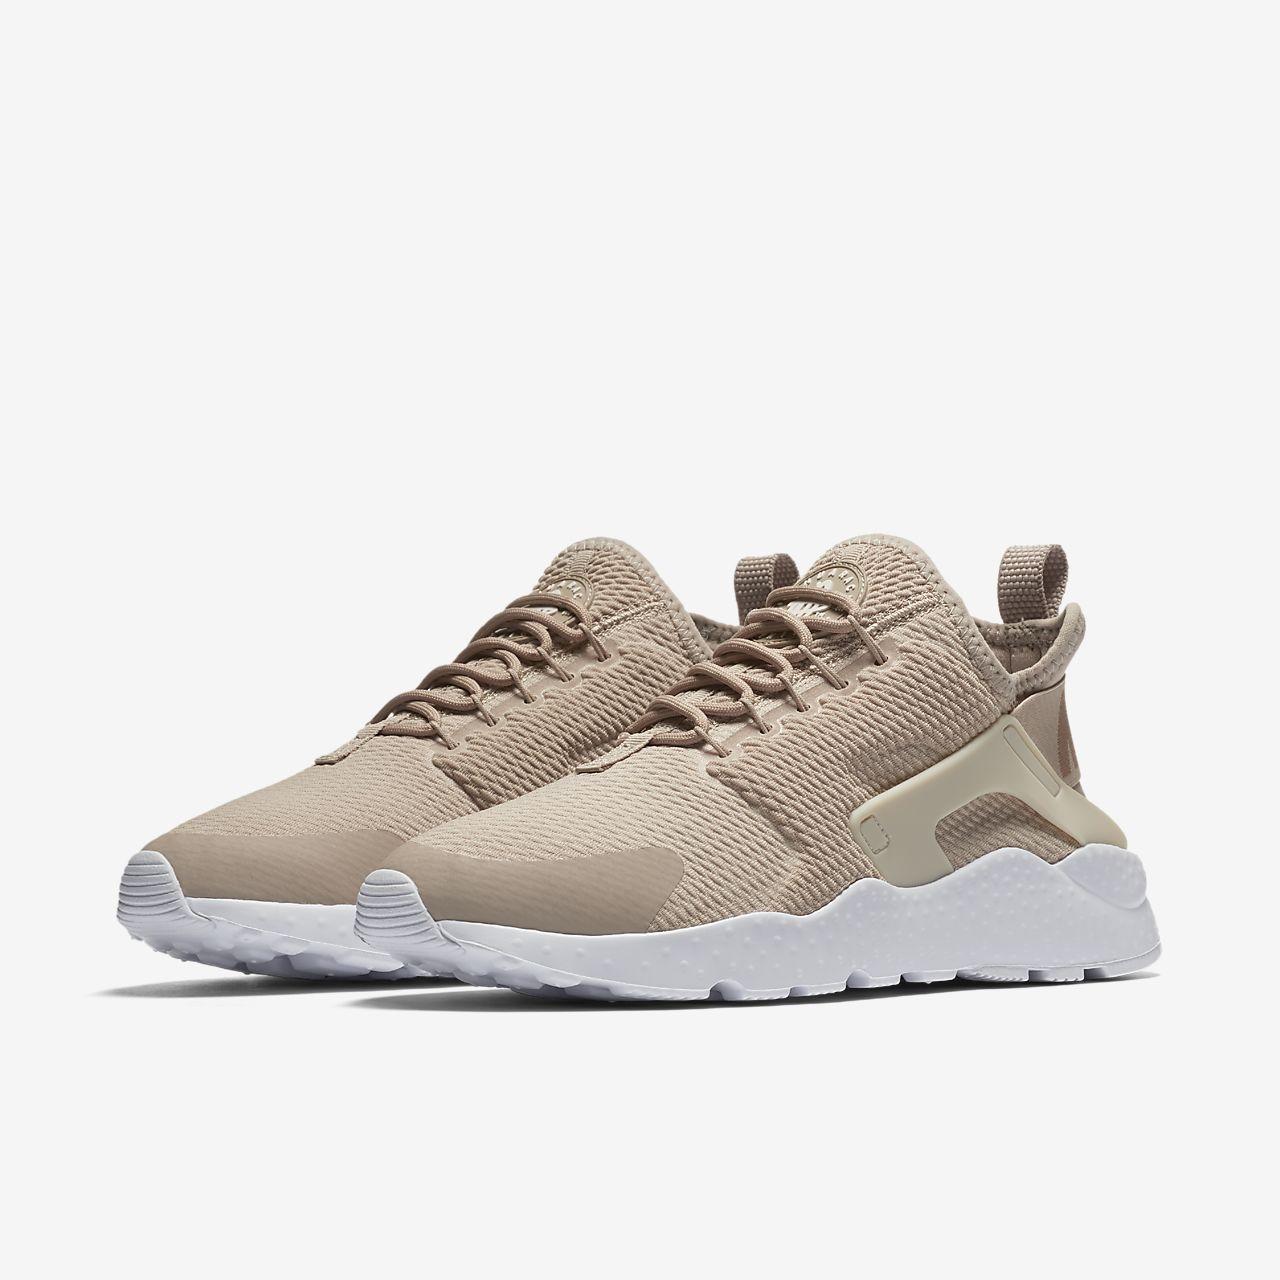 bdc9584d689d Nike Air Huarache Ultra Women s Shoe